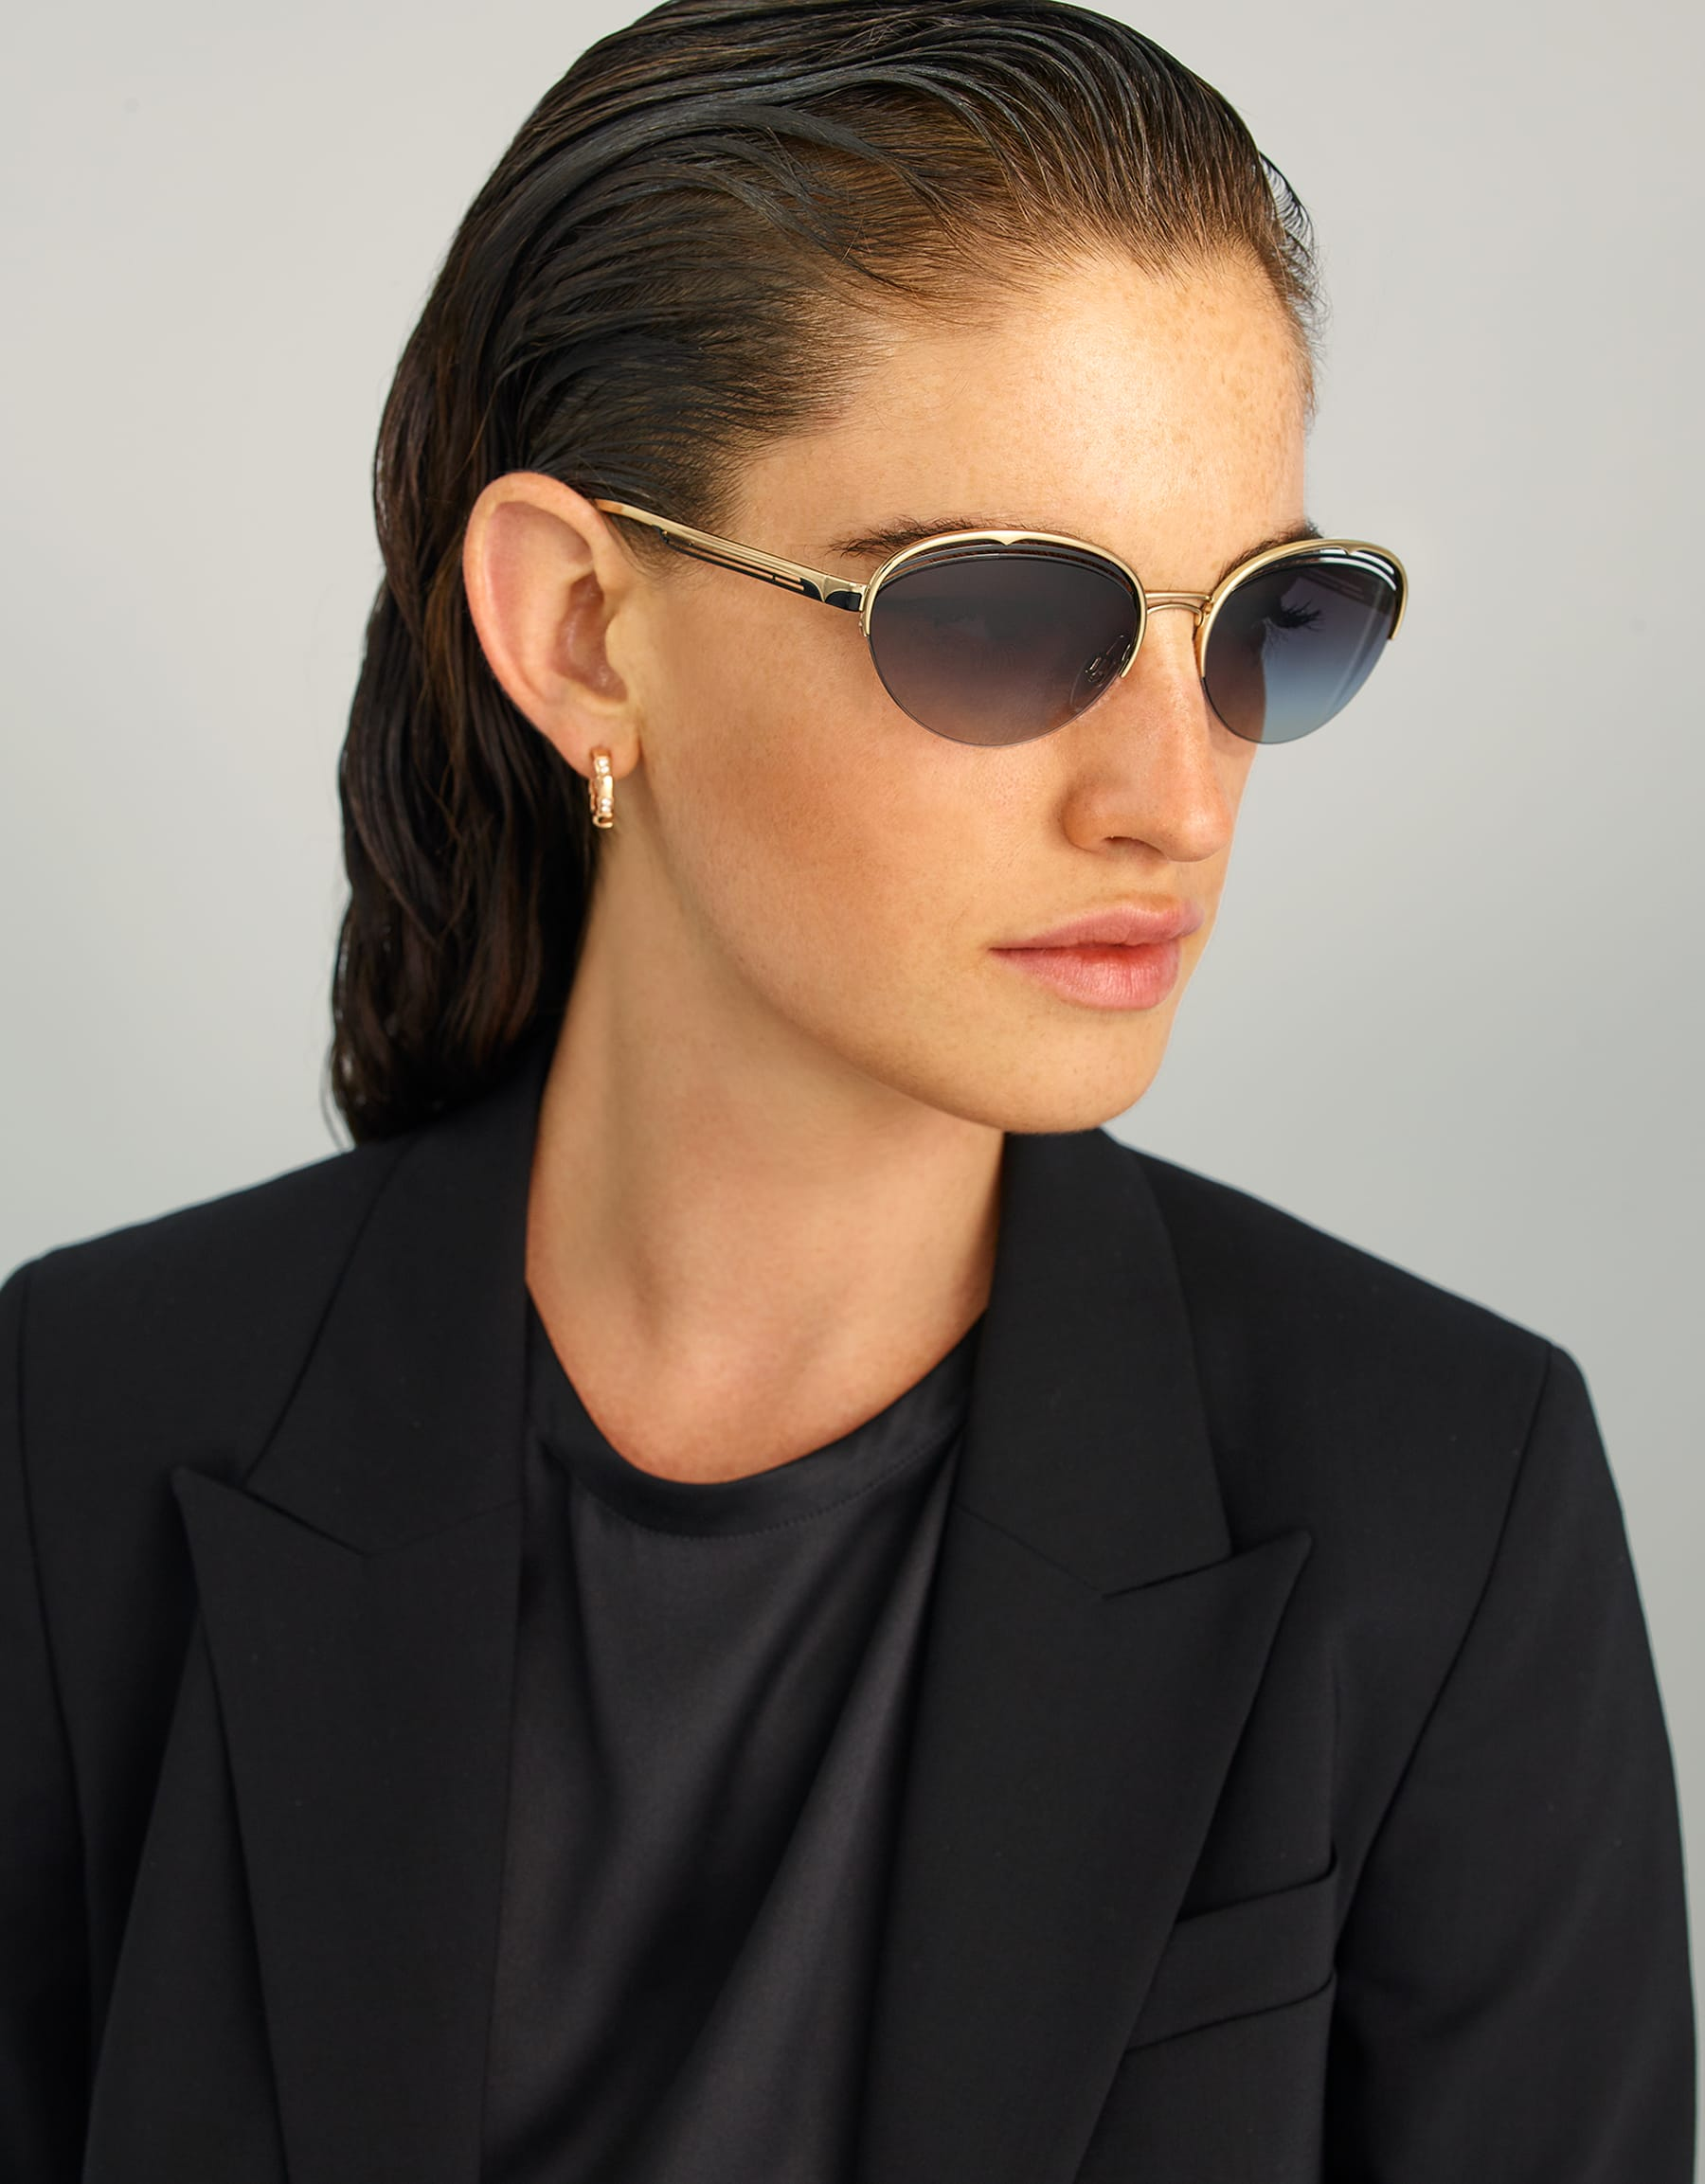 Bulgari B.zero1 B.retrovibe half rim oval metal sunglasses. 903893 image 3